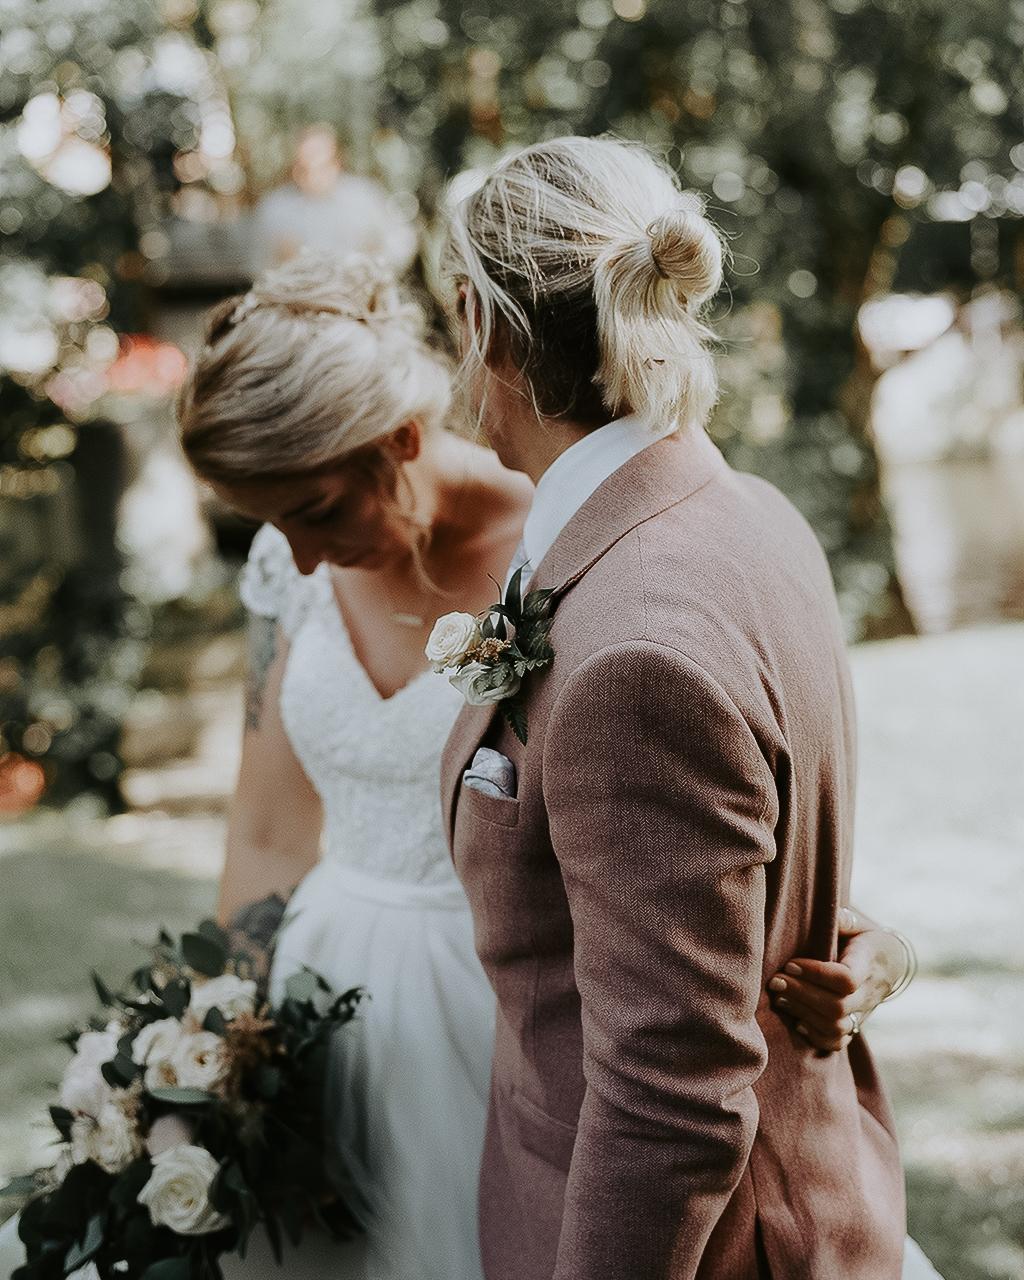 Wedding details - Elopement wedding in France